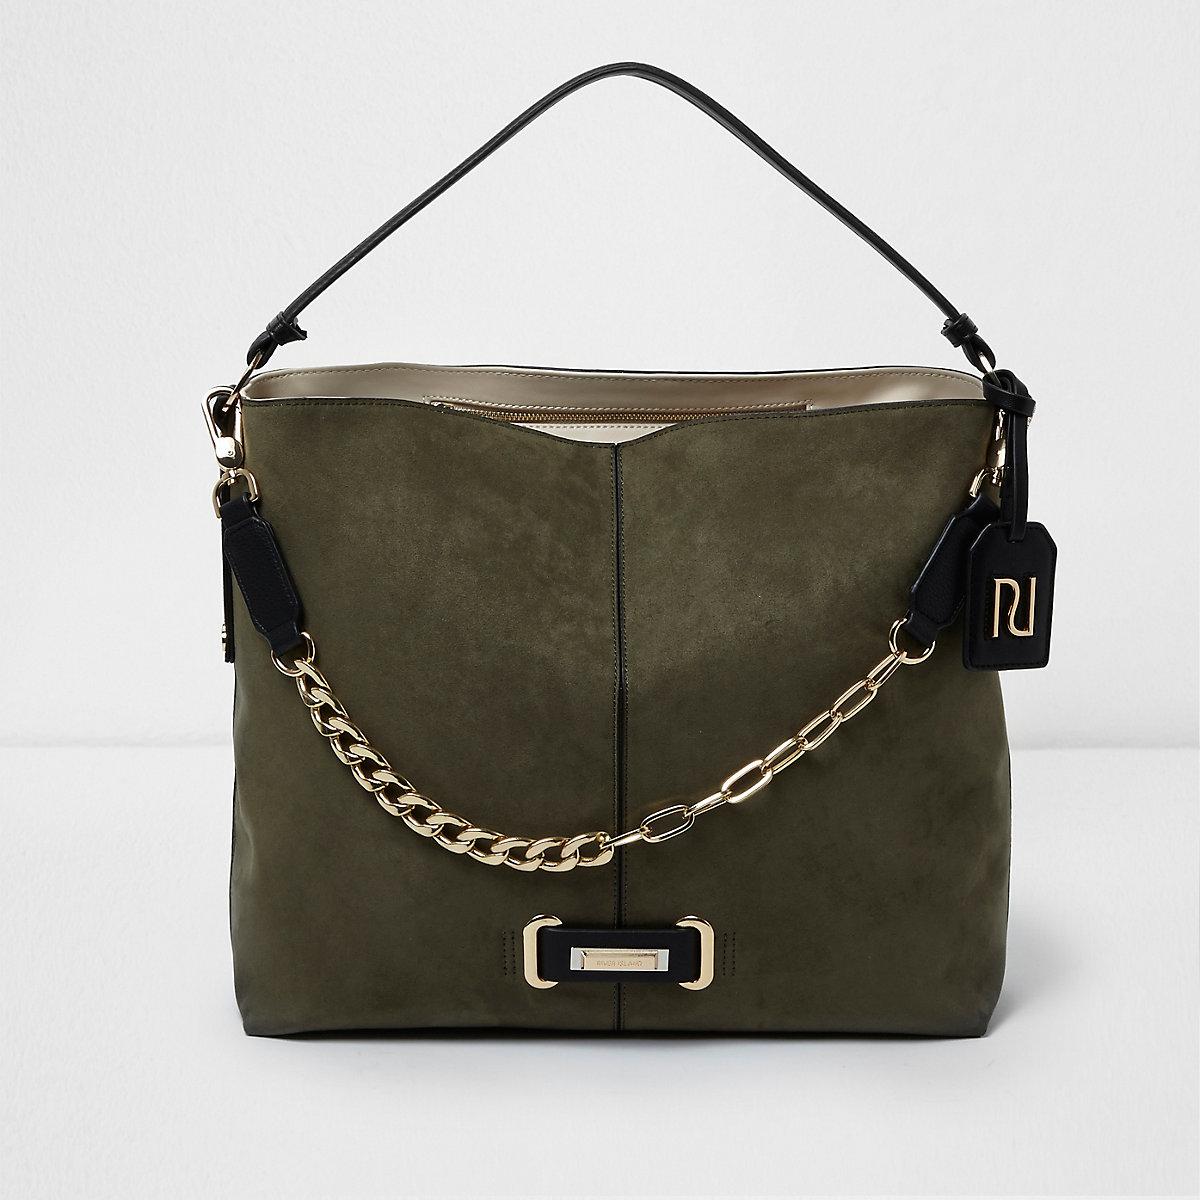 27acae85ee23 Khaki green chain front underarm slouch bag - Shoulder Bags - Bags   Purses  - women